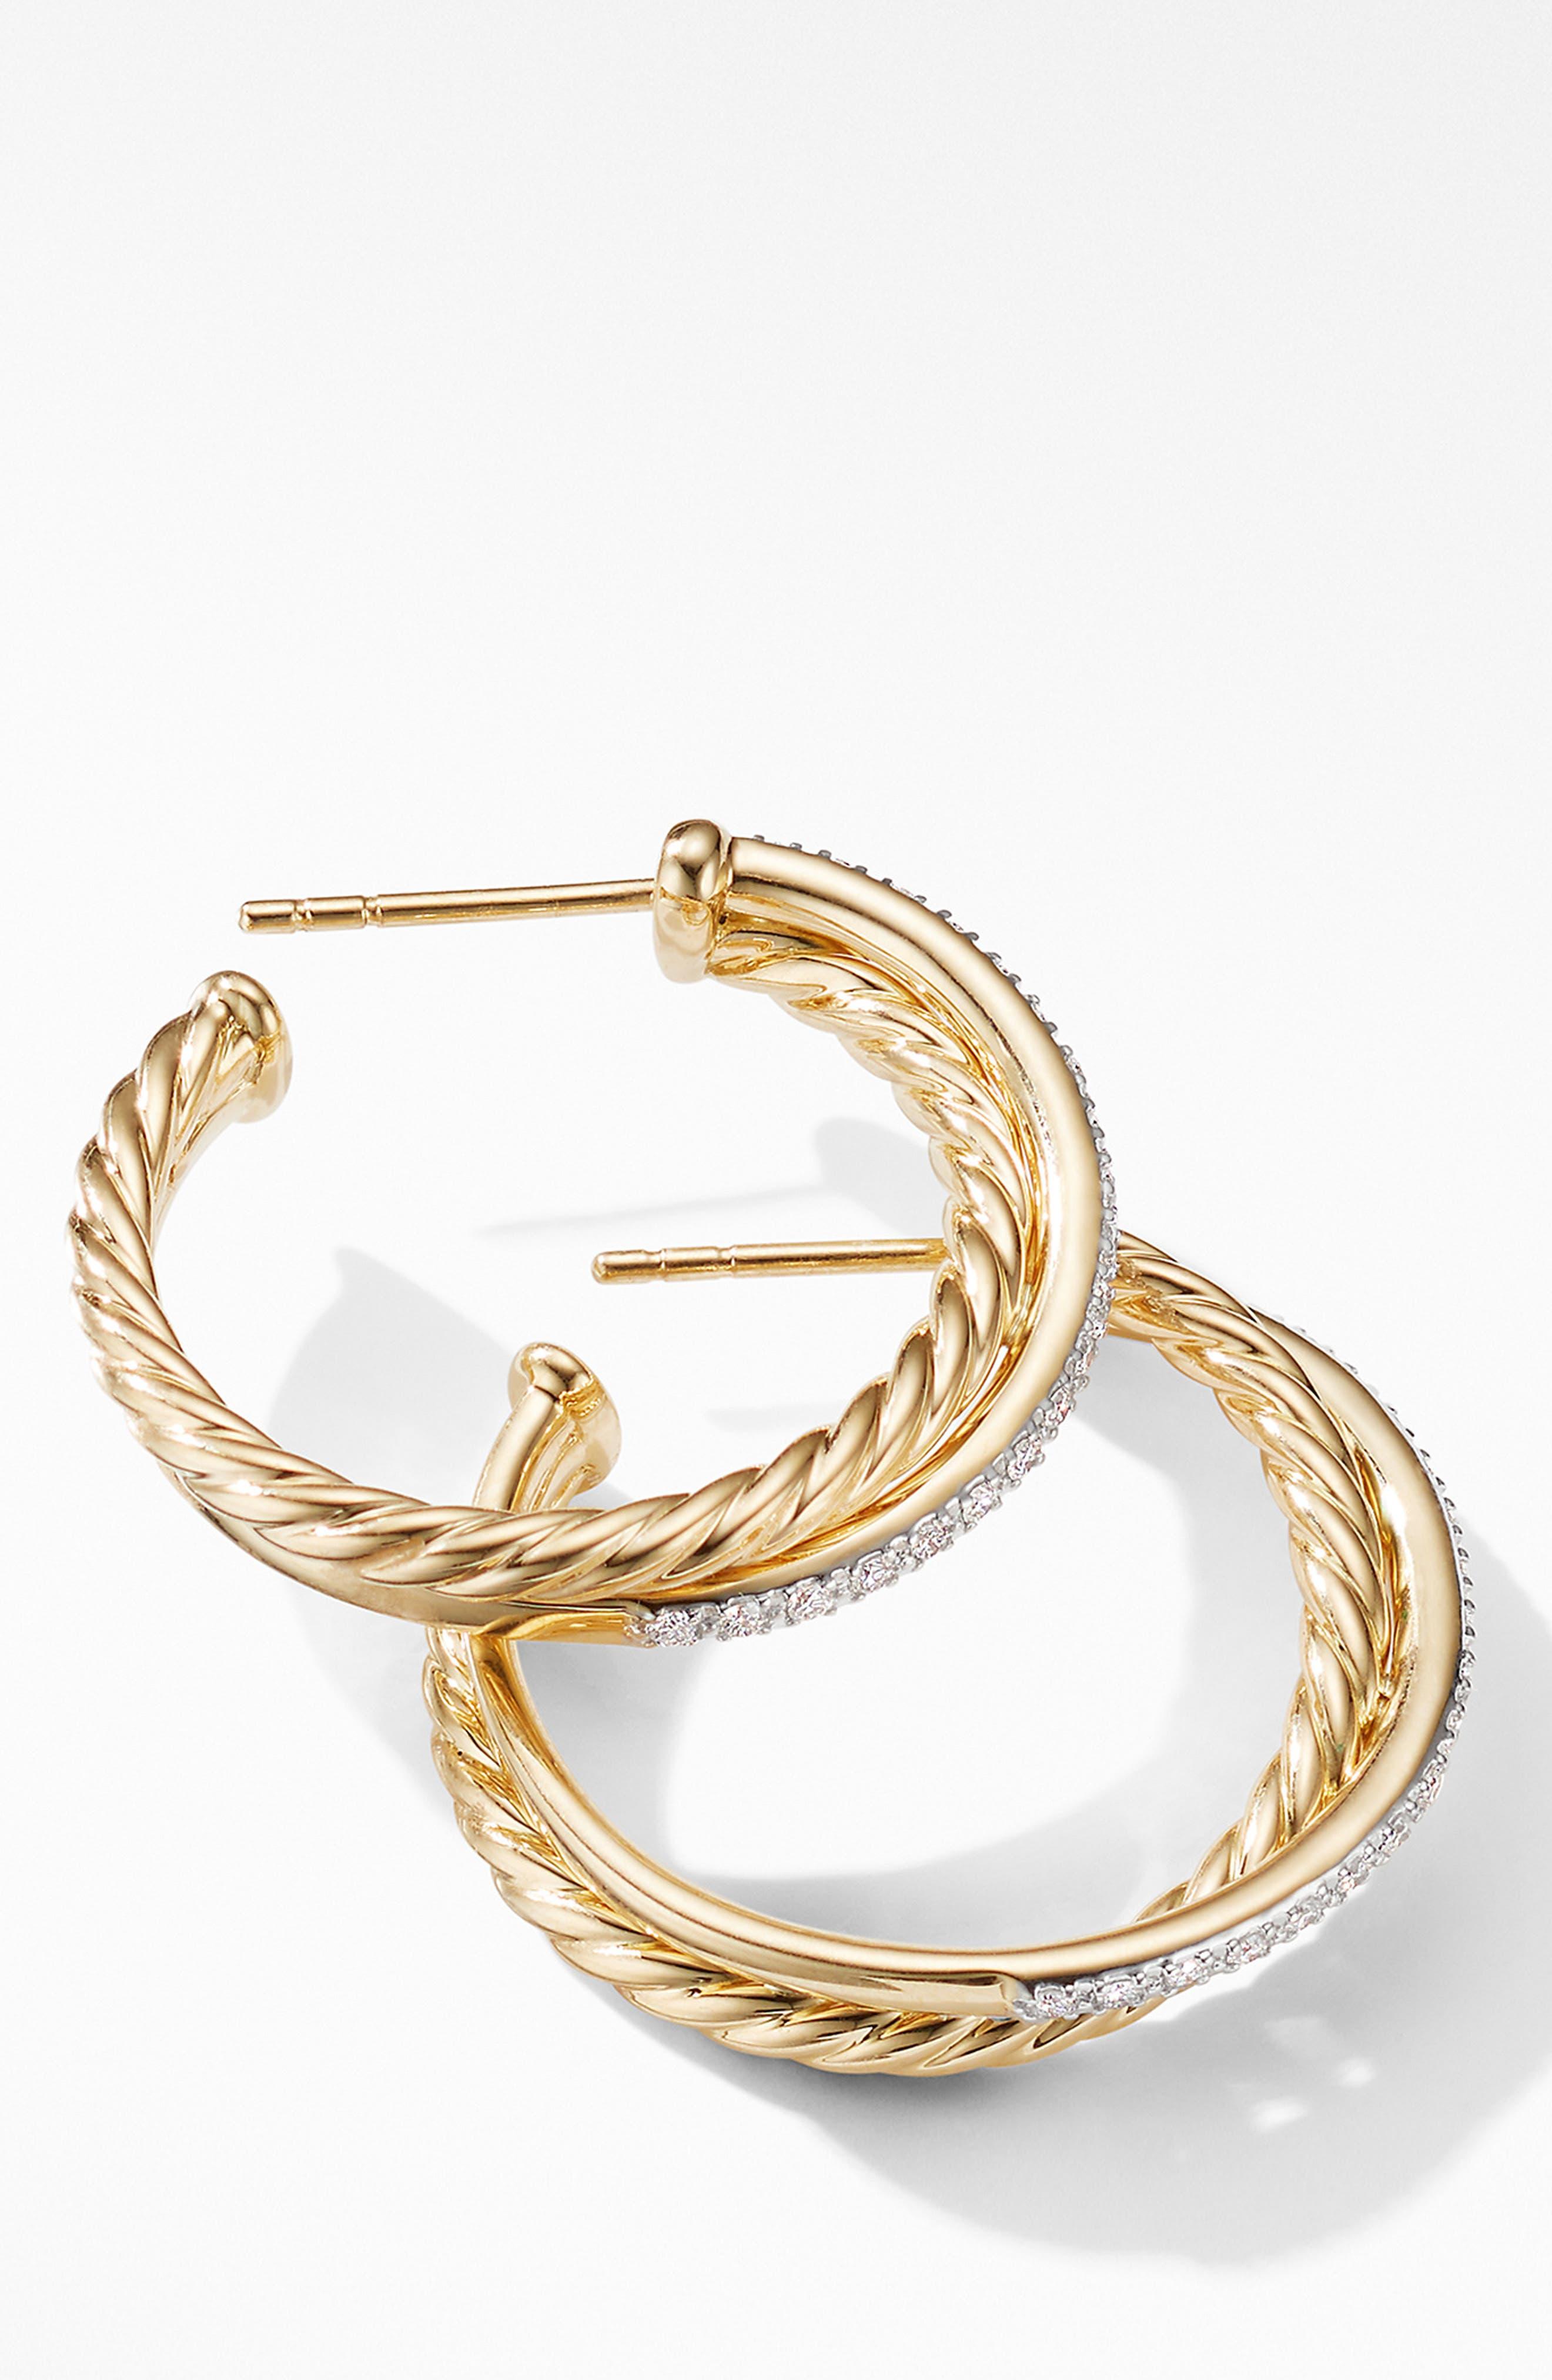 DAVID YURMAN, Medium Crossover Hoop Earrings with Diamonds, Alternate thumbnail 2, color, GOLD/ DIAMOND